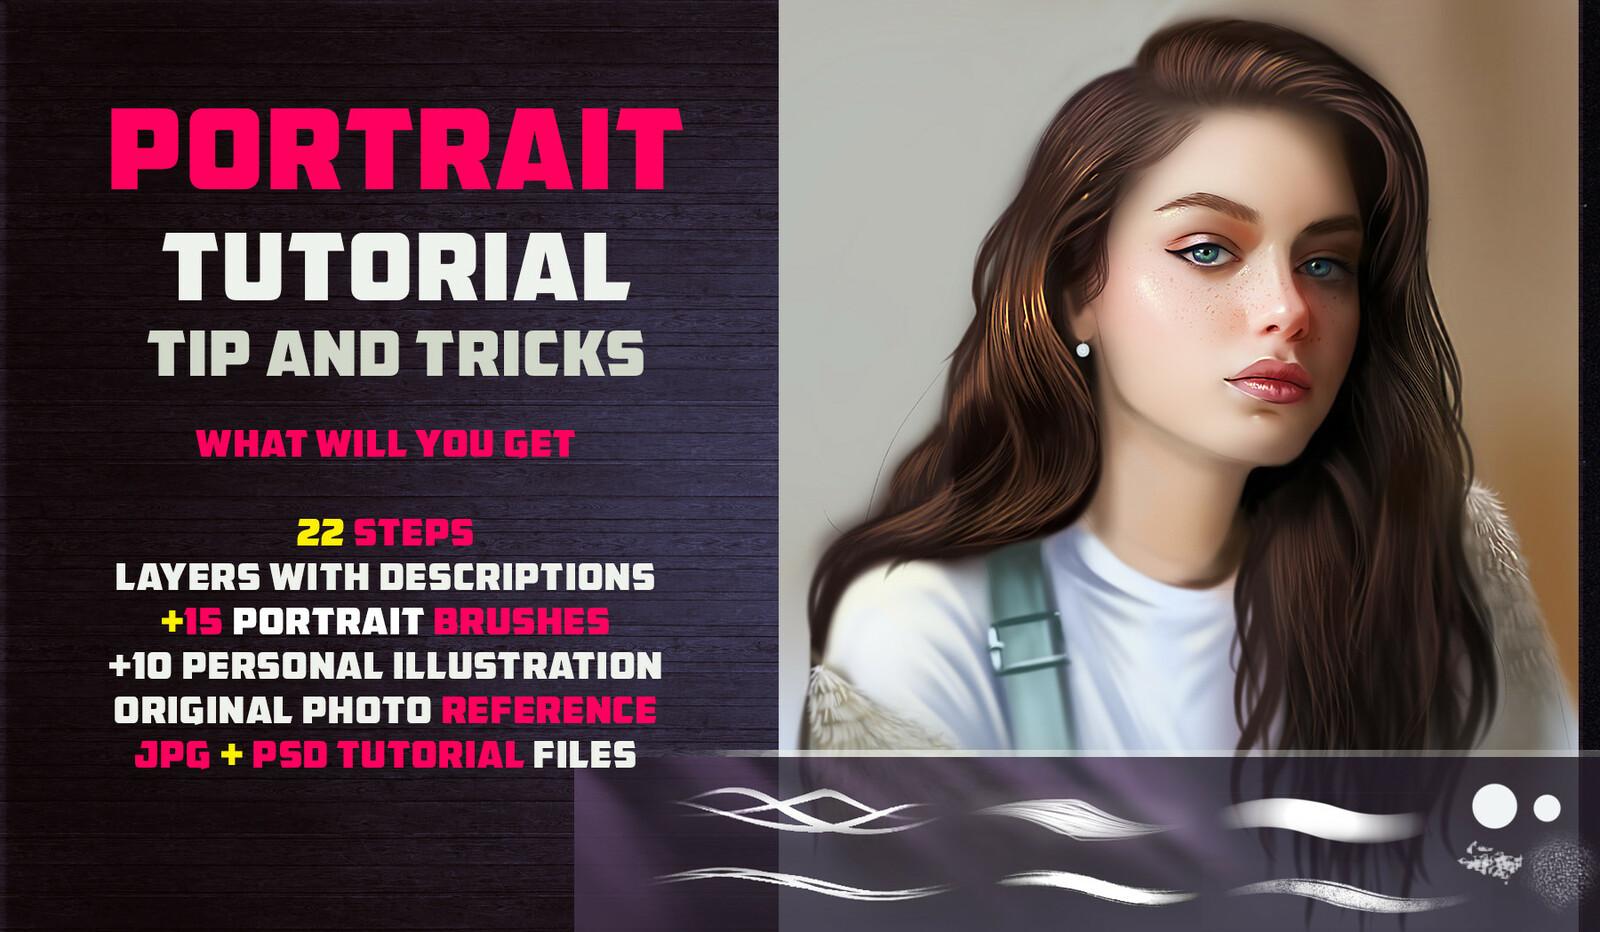 Artstation marketplace: https://www.artstation.com/vurdem/store/2qOv/portrait-tutorial-15-brushes-tip-and-tricks-photoshop